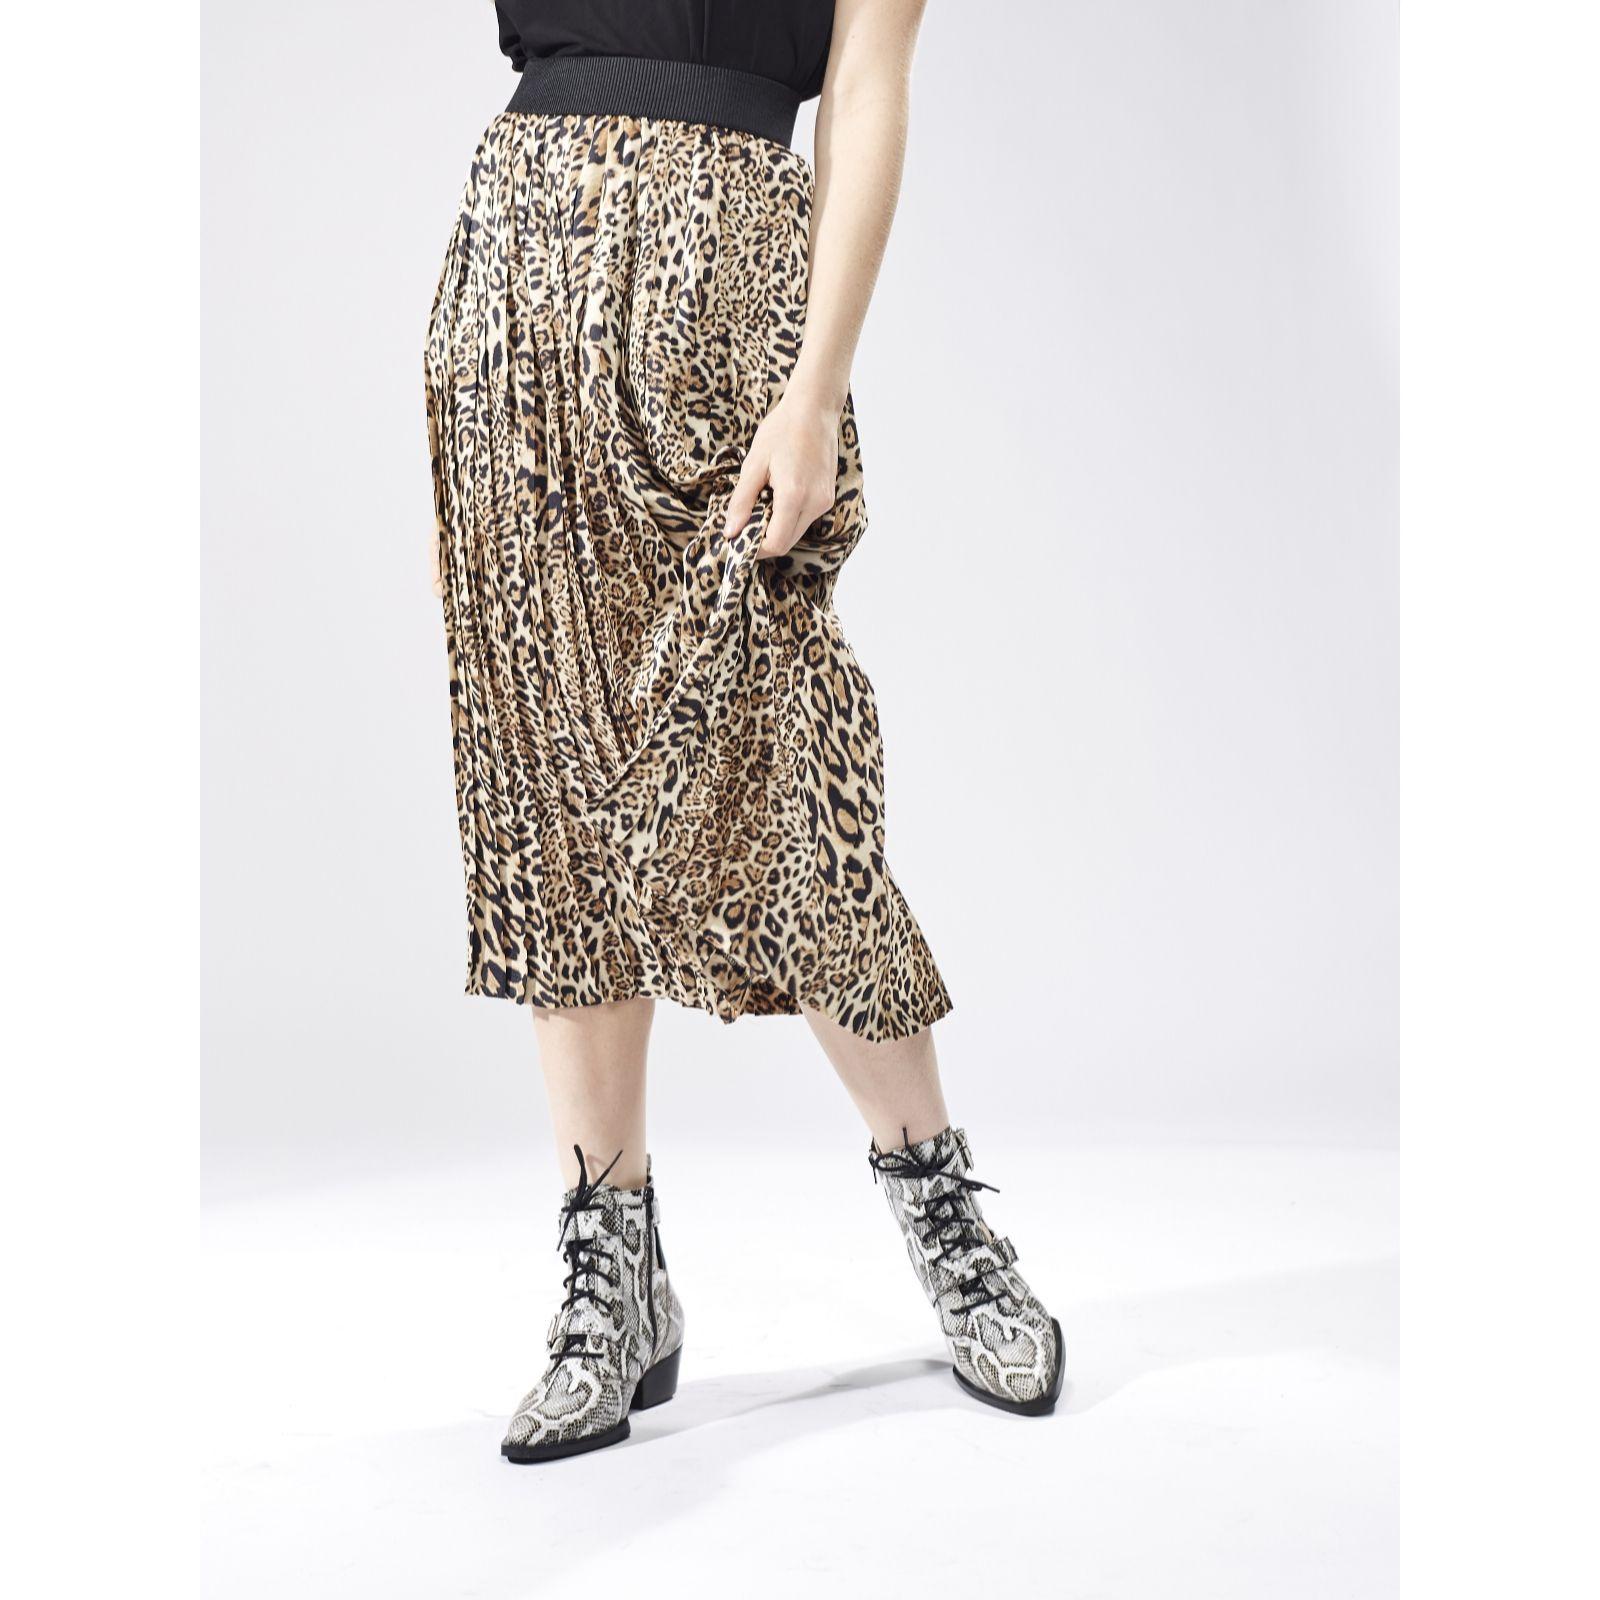 3587fe9810 Helene Berman Animal Printed Pleated Midi Skirt - QVC UK